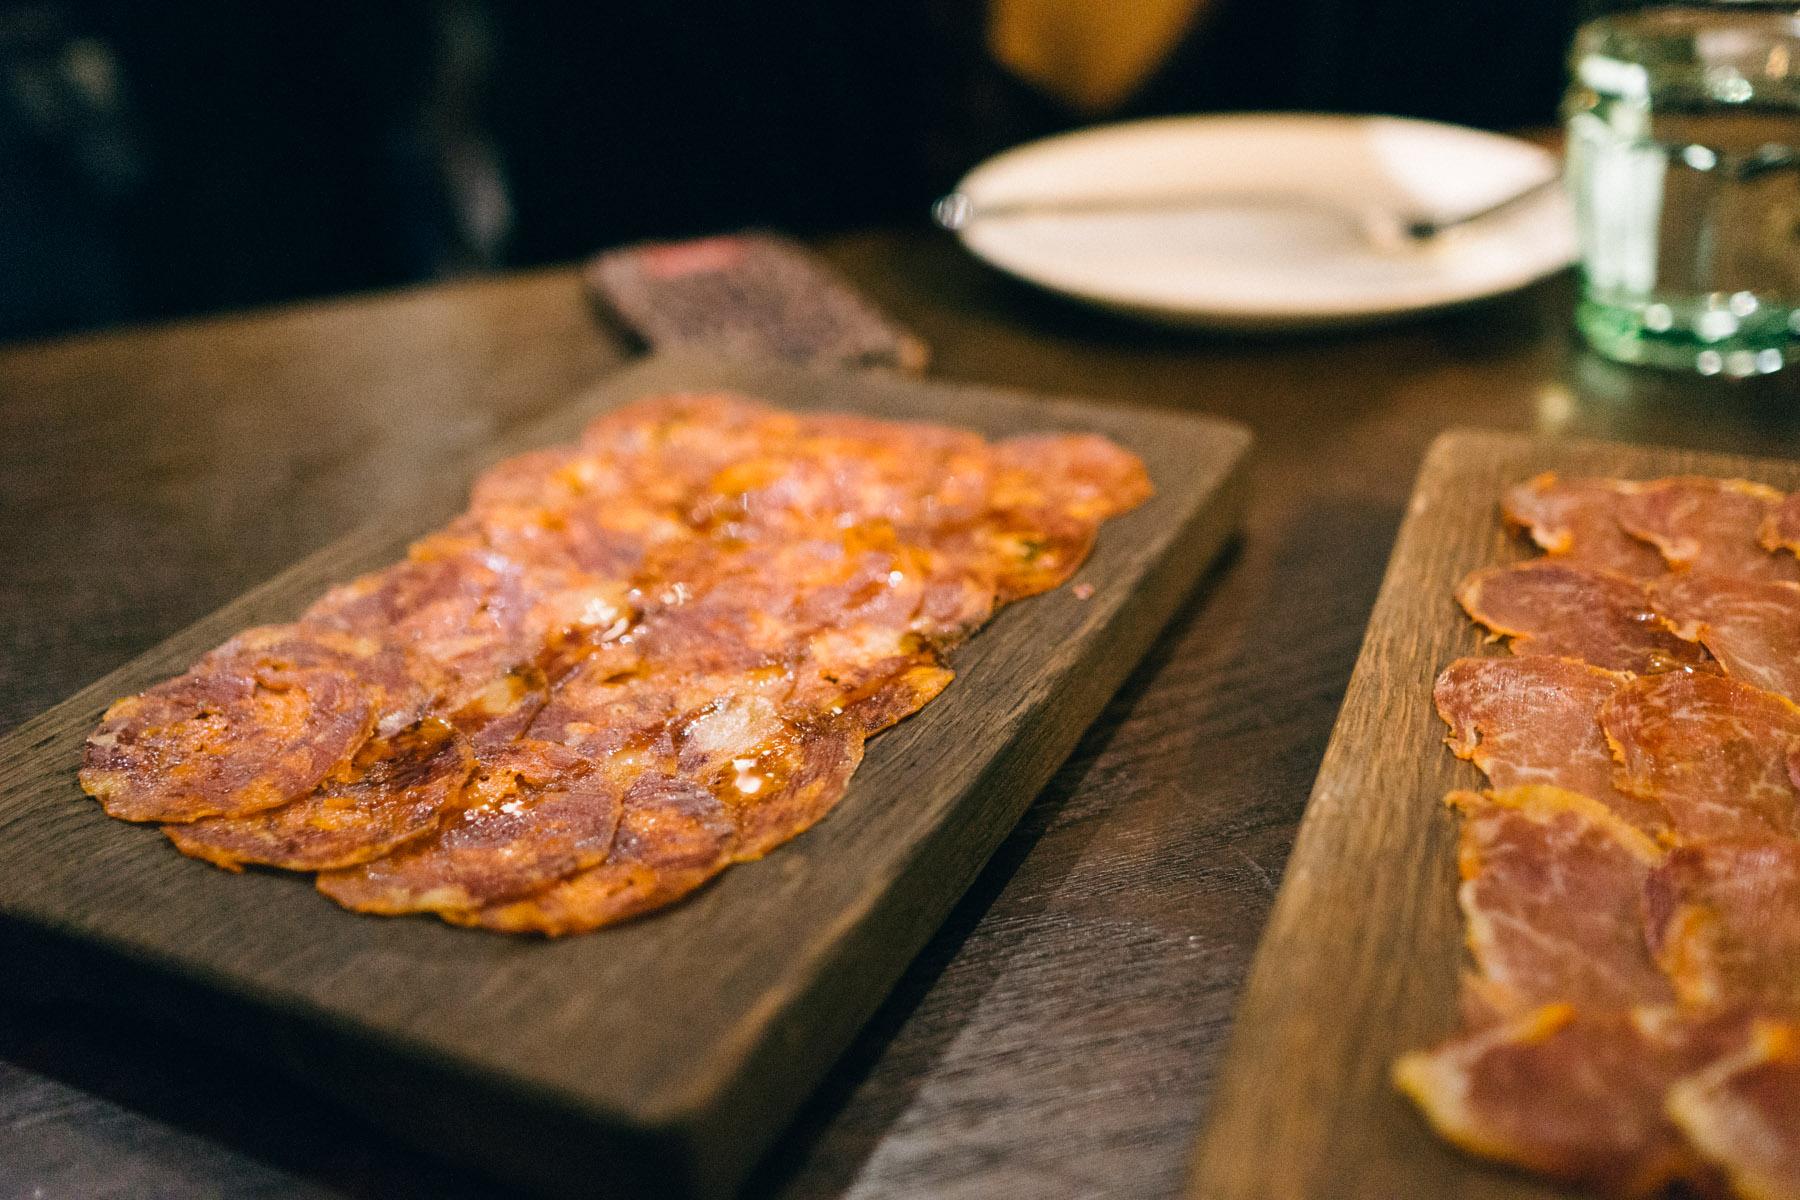 ham-and-sherry-spanish-tapas-ship-street-wan-chai-hong-kong-jason-atherton-6